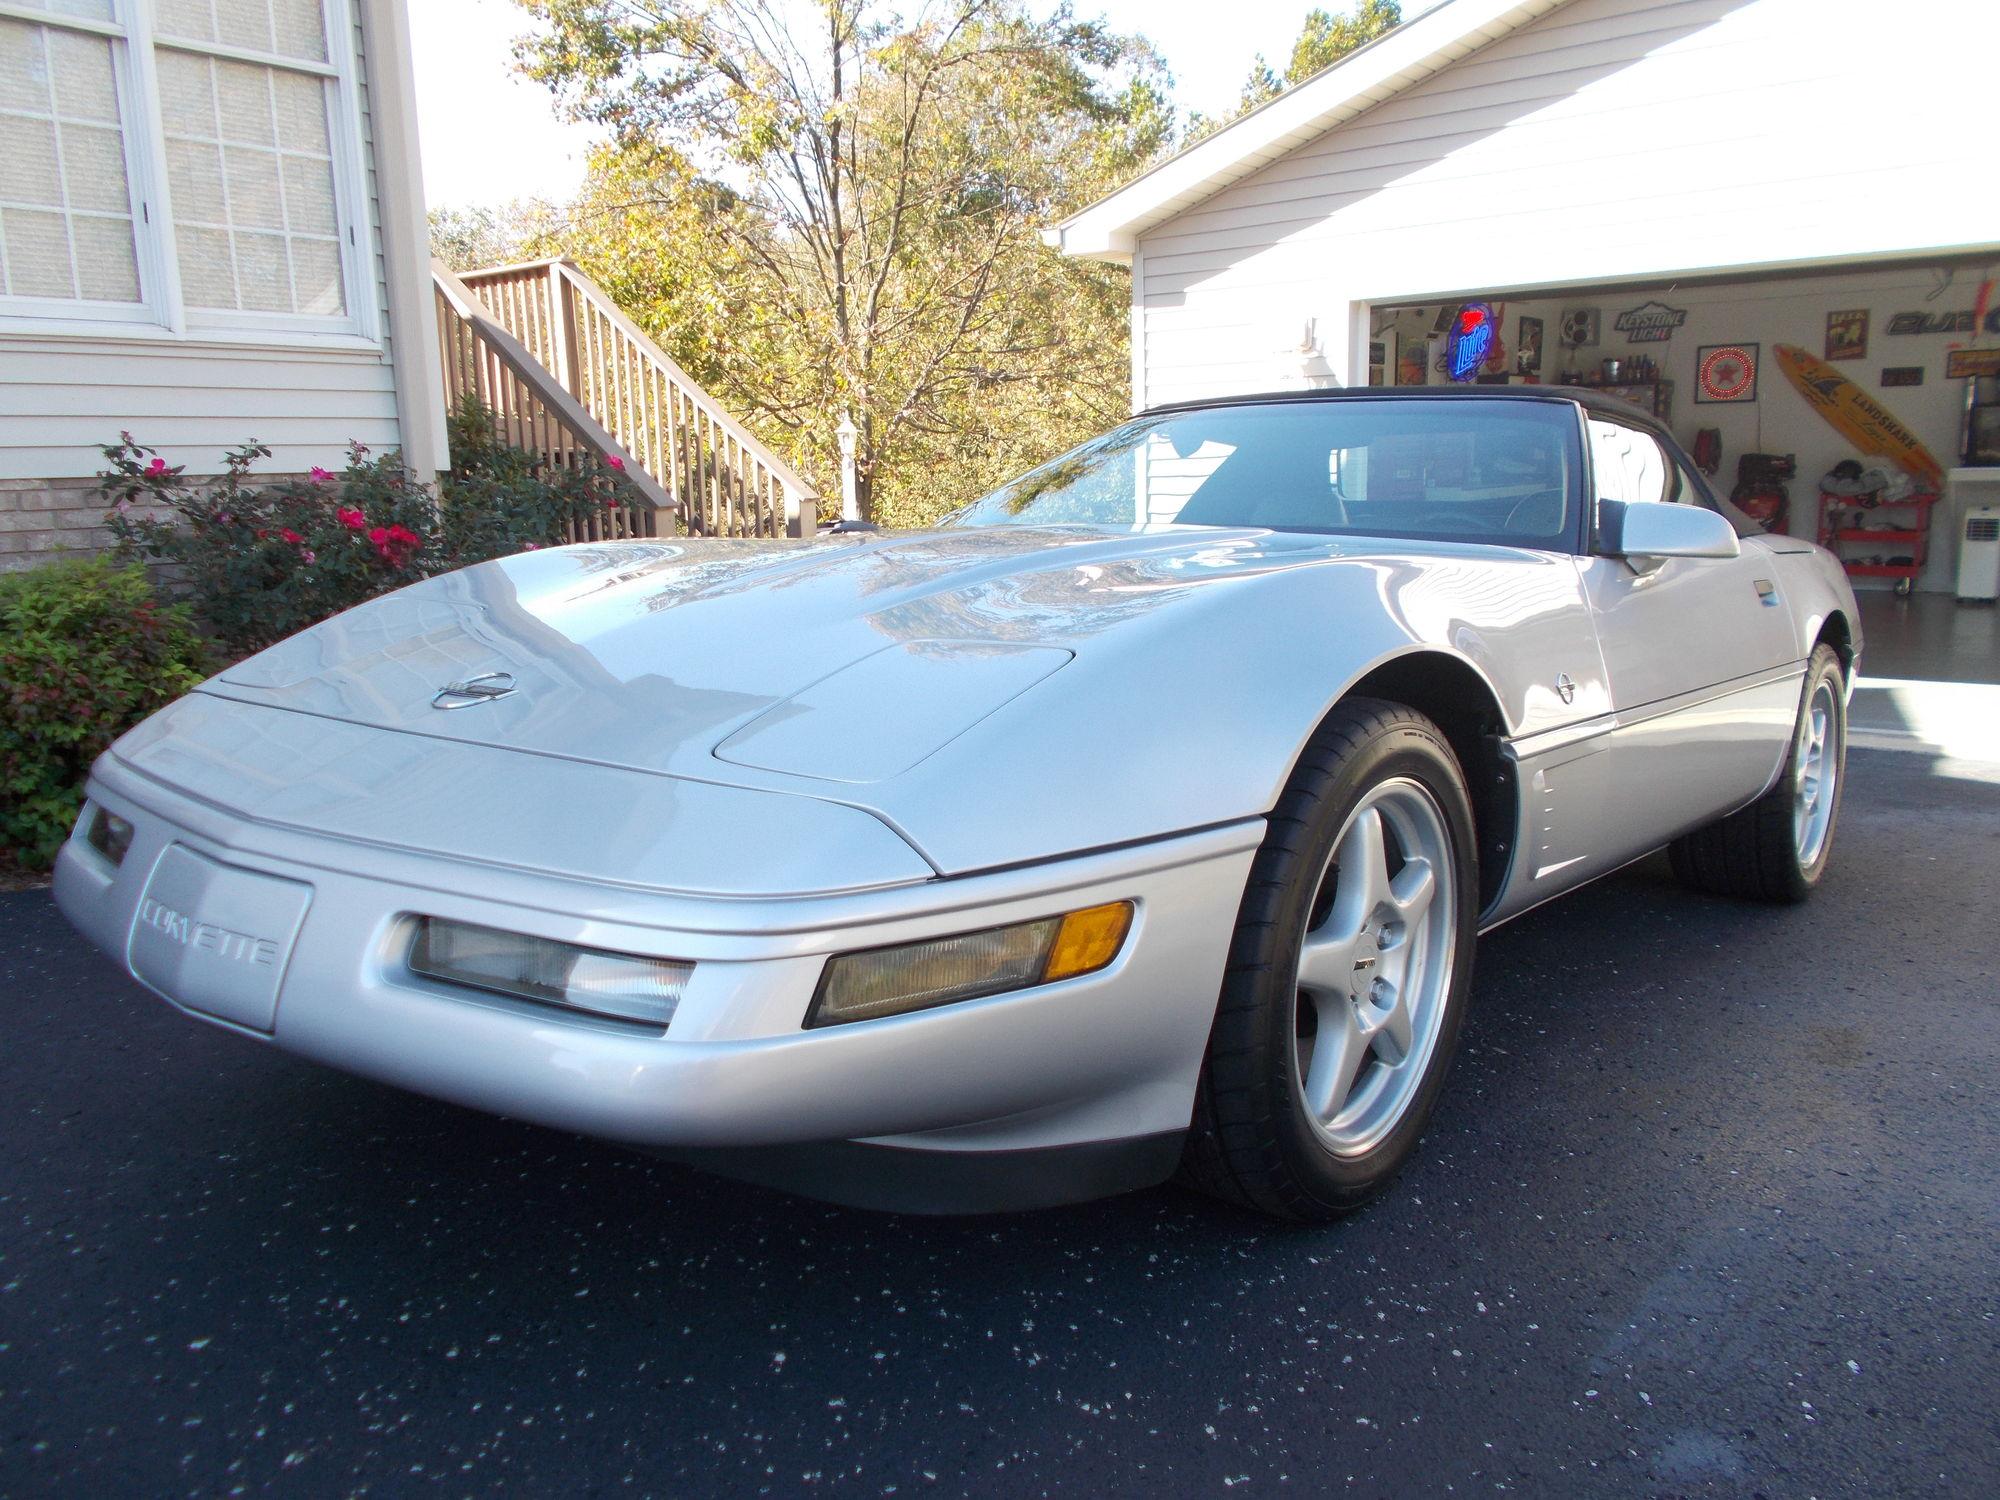 1996 Corvette Convertible Collector Edition, LT-4 17000 miles - CorvetteForum - Chevrolet